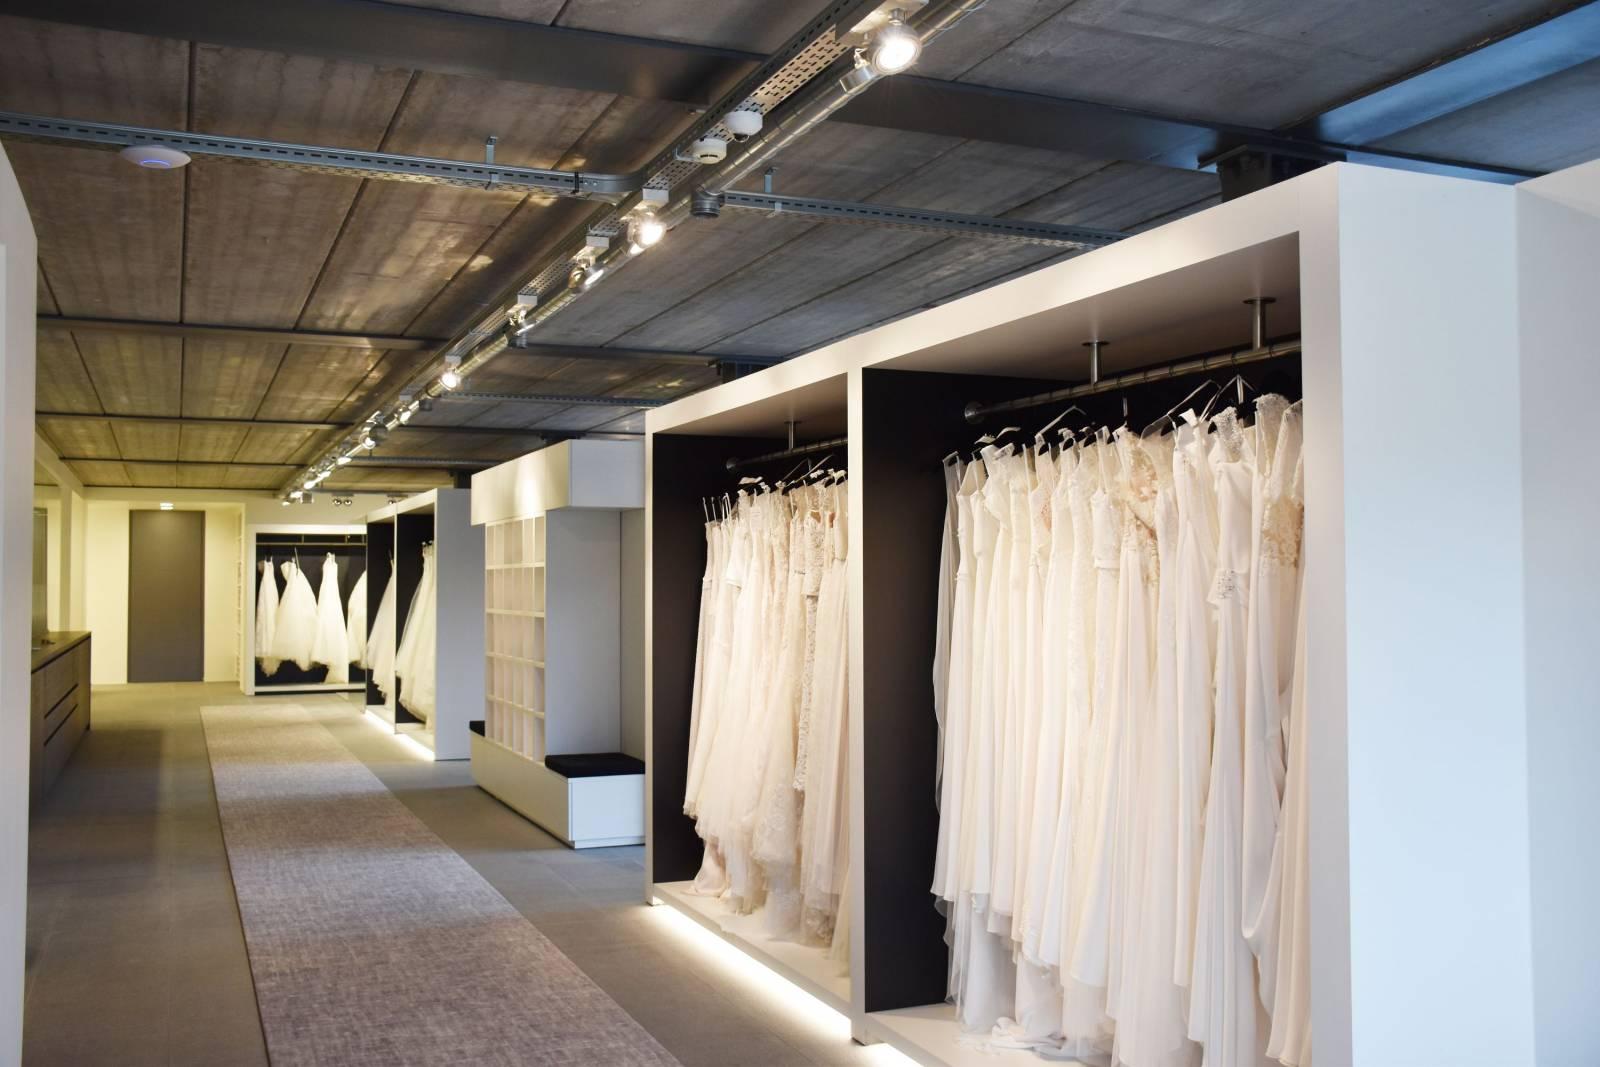 Cermo Concept - Bruidsmode - Kostuum - House of Weddings  - 4